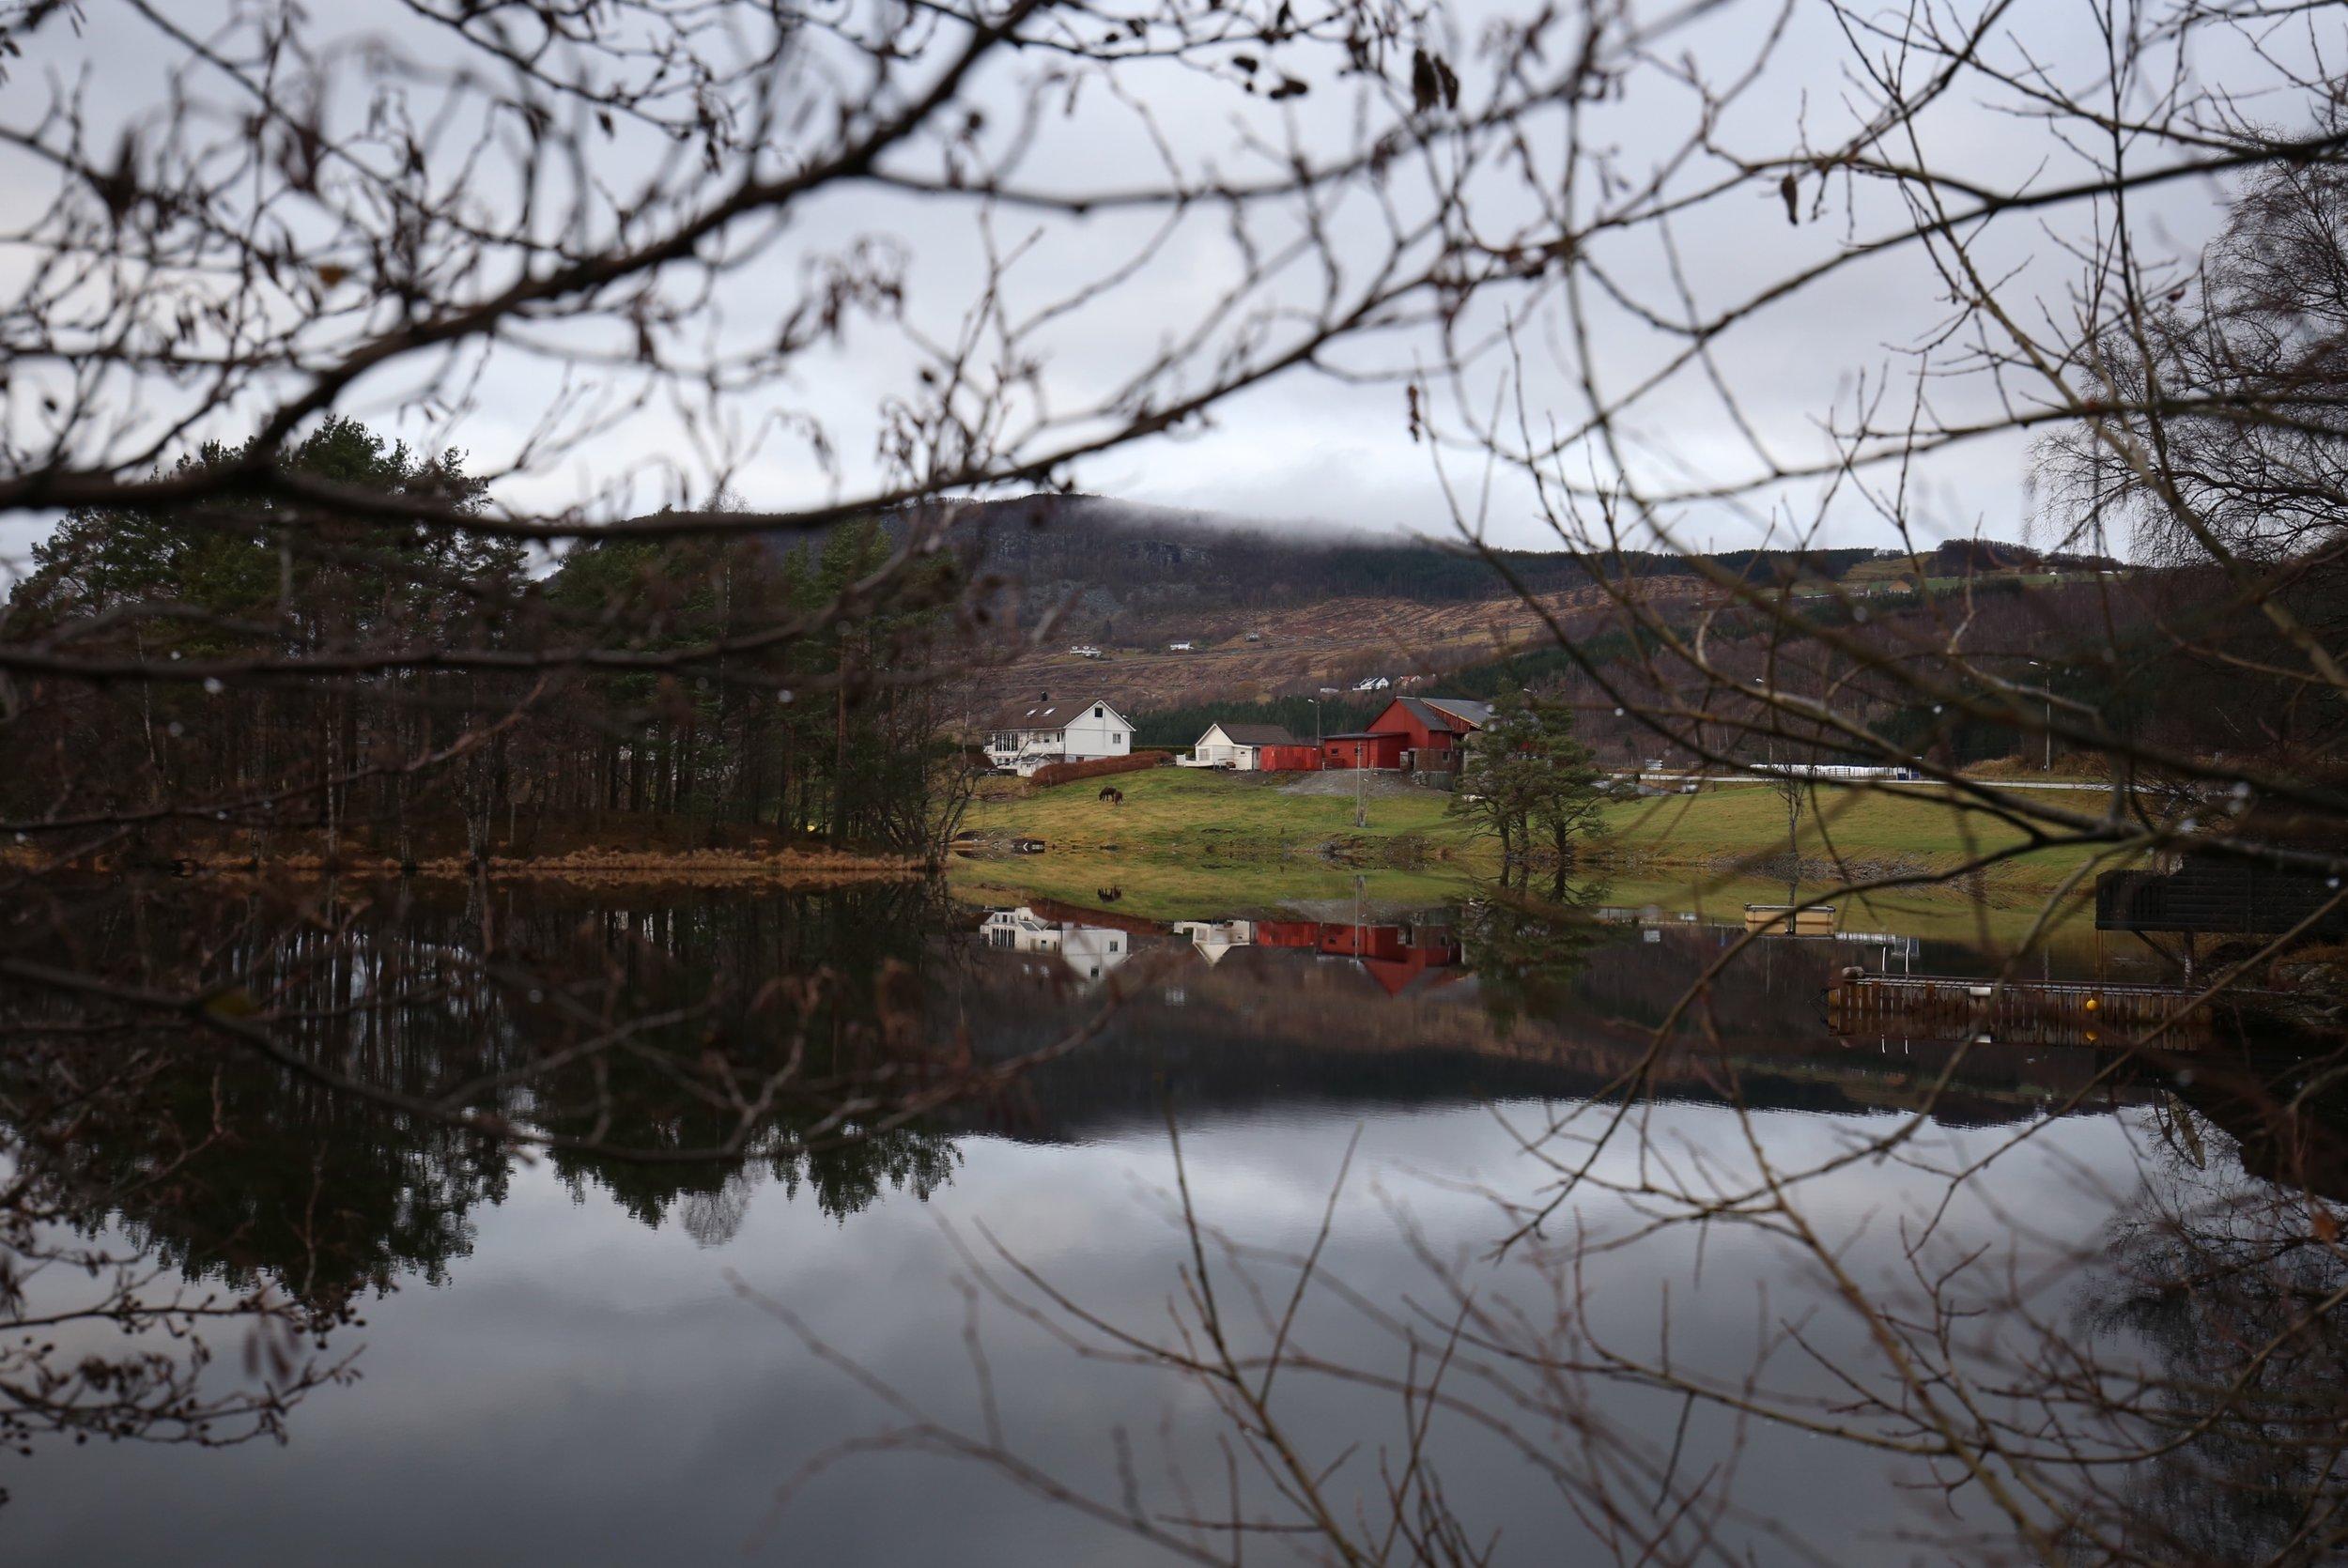 Norwegian farm by fjord